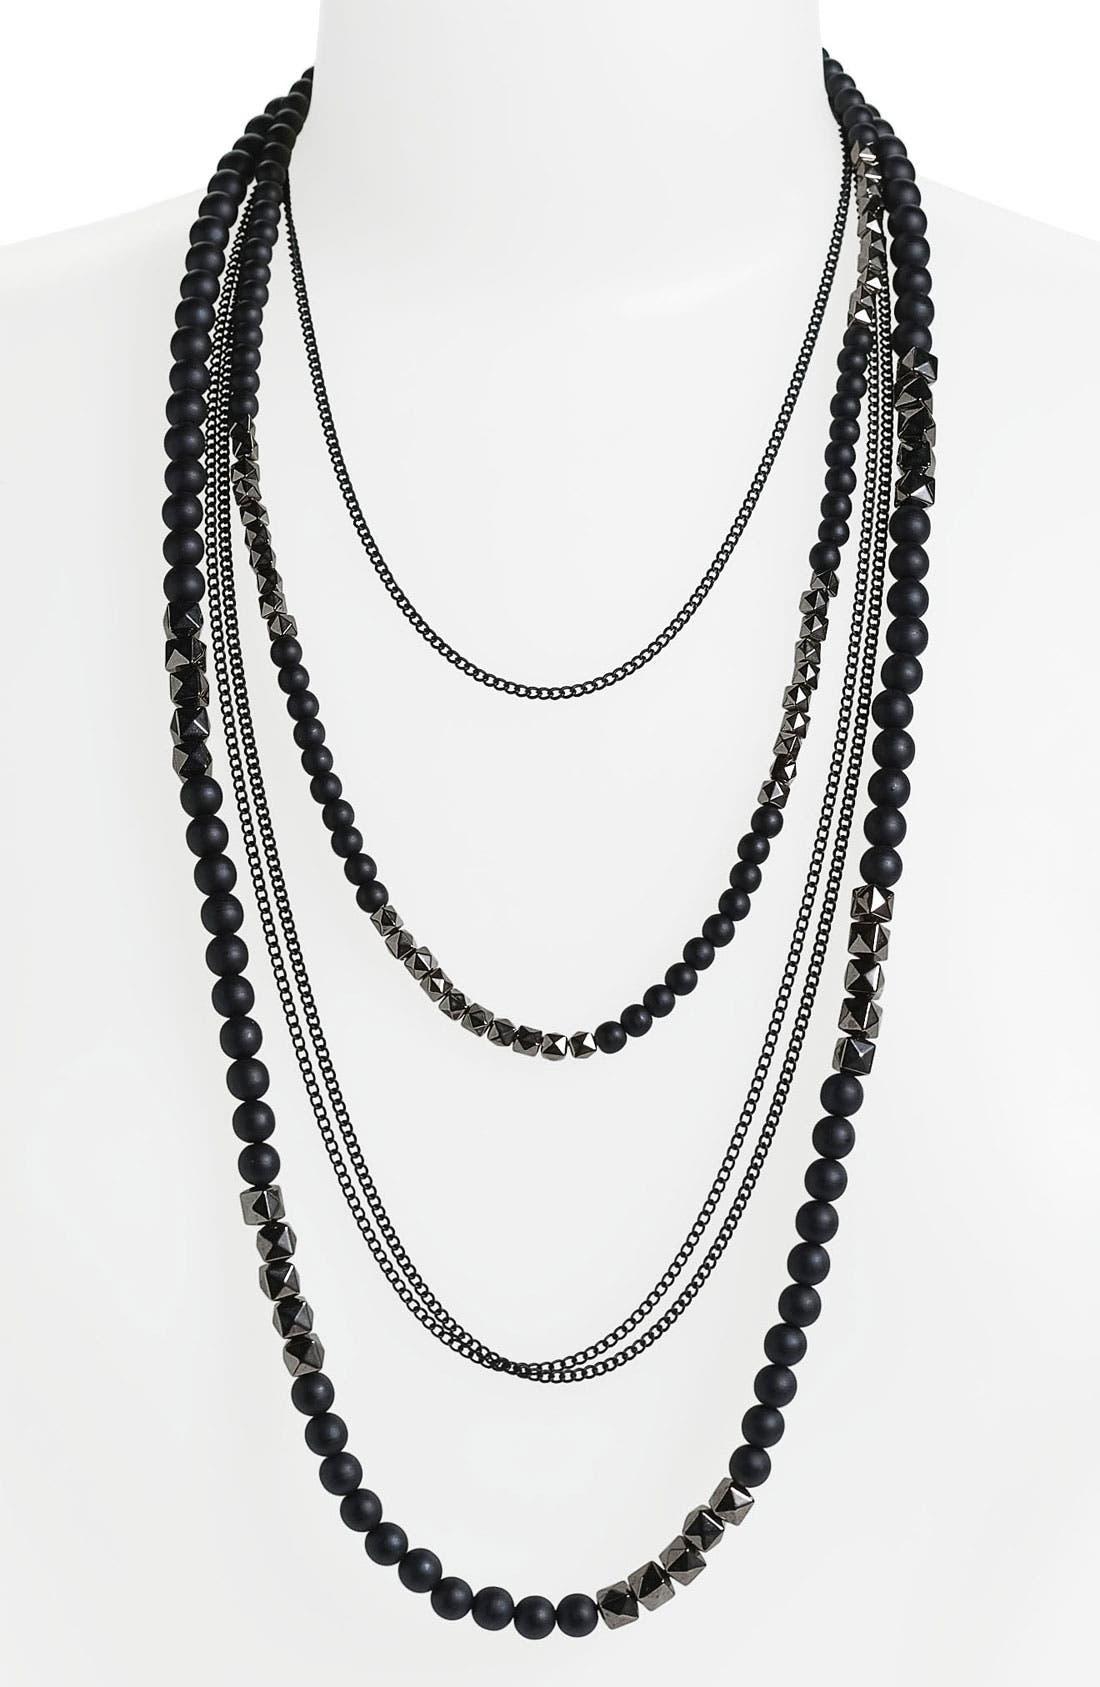 Main Image - Natasha Couture Multistrand Necklace